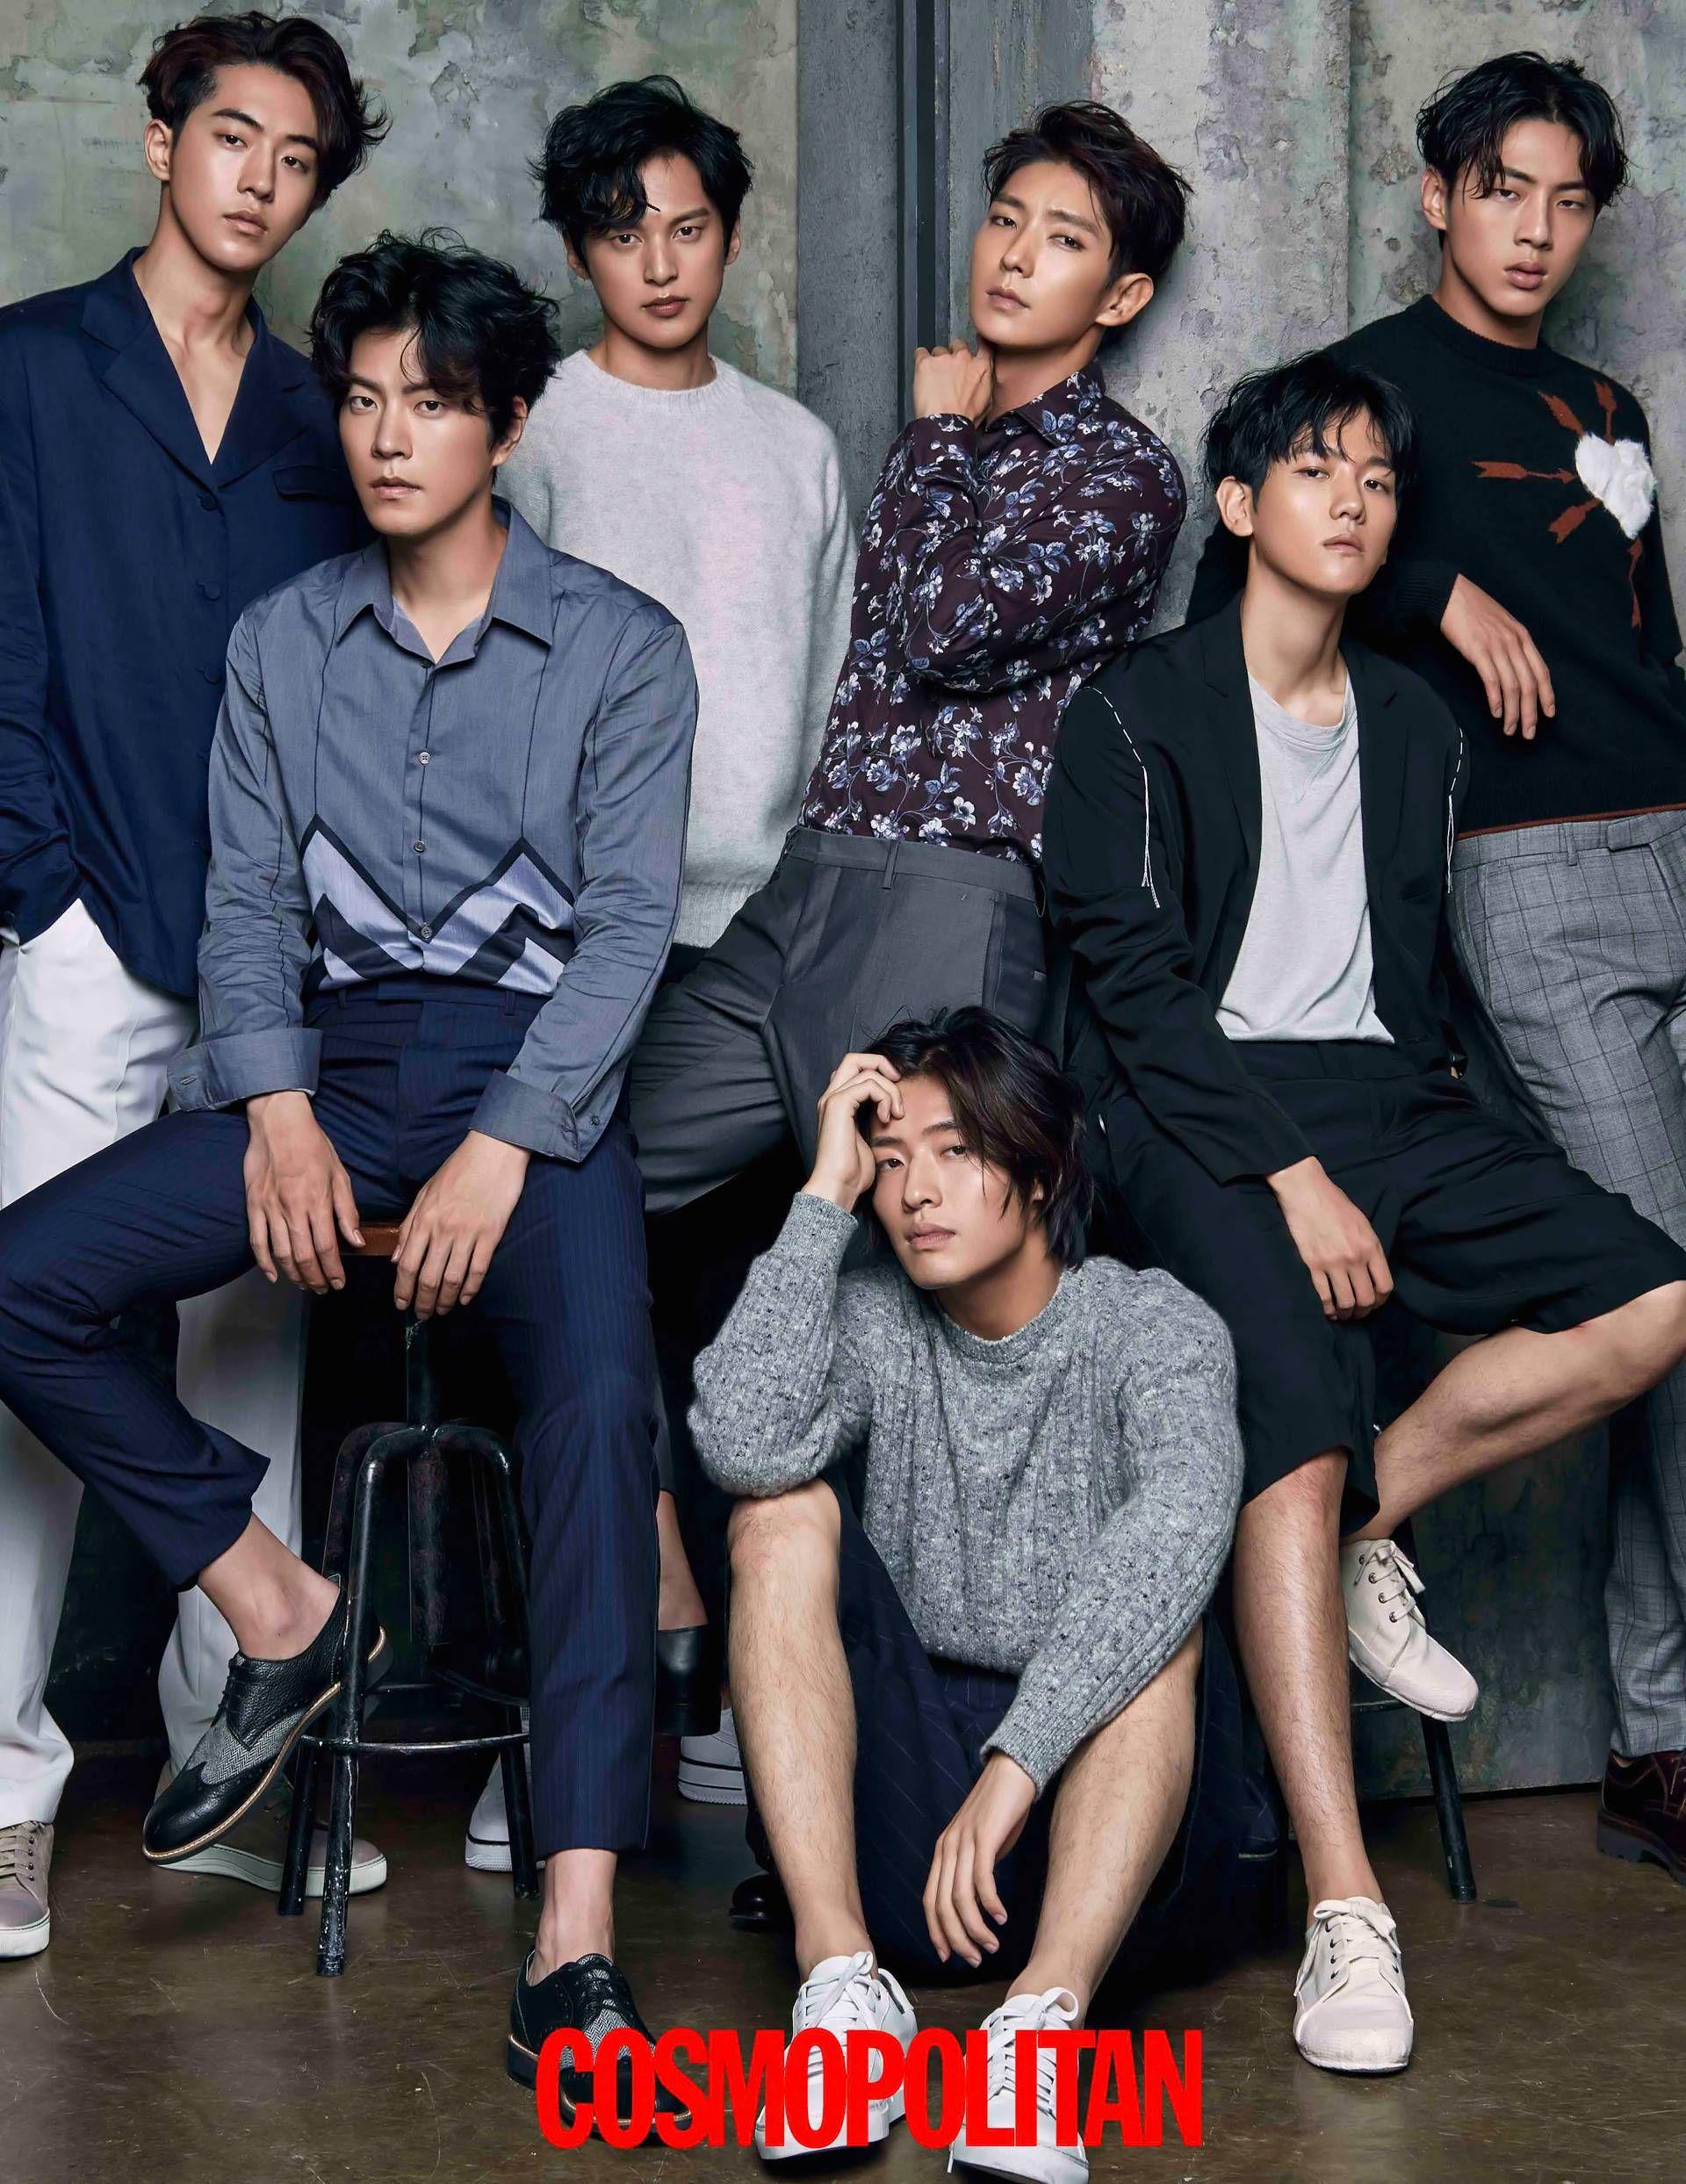 Cosmopolitan Scarlet Heart Ryeo Photoshoot